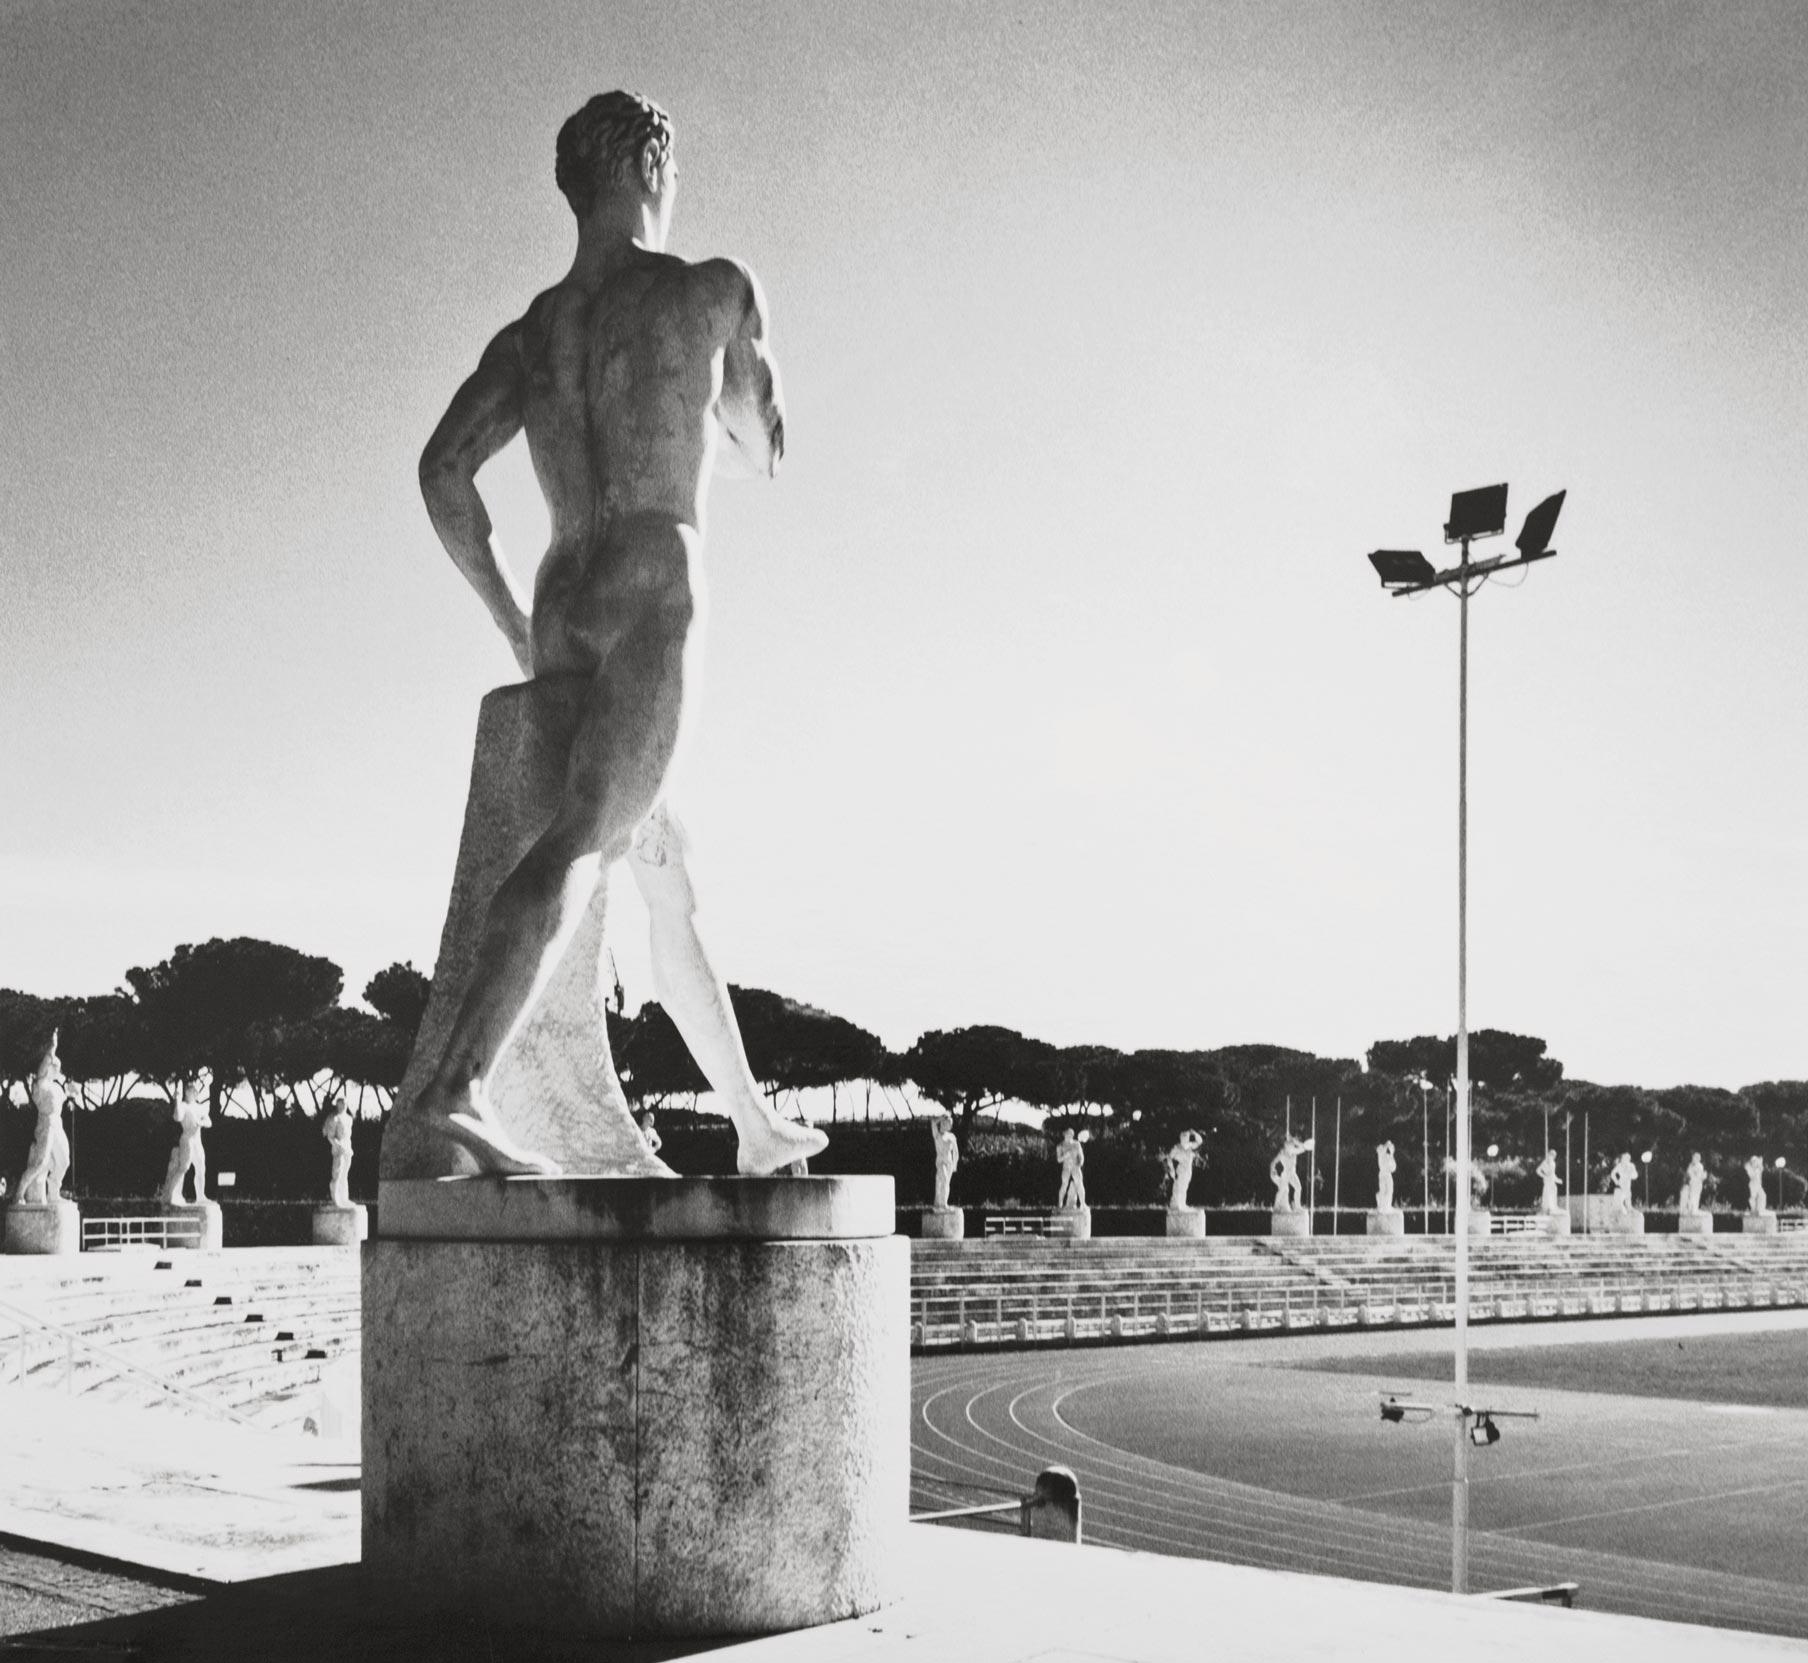 Stadio Marmi Roma Mimmo Jodice